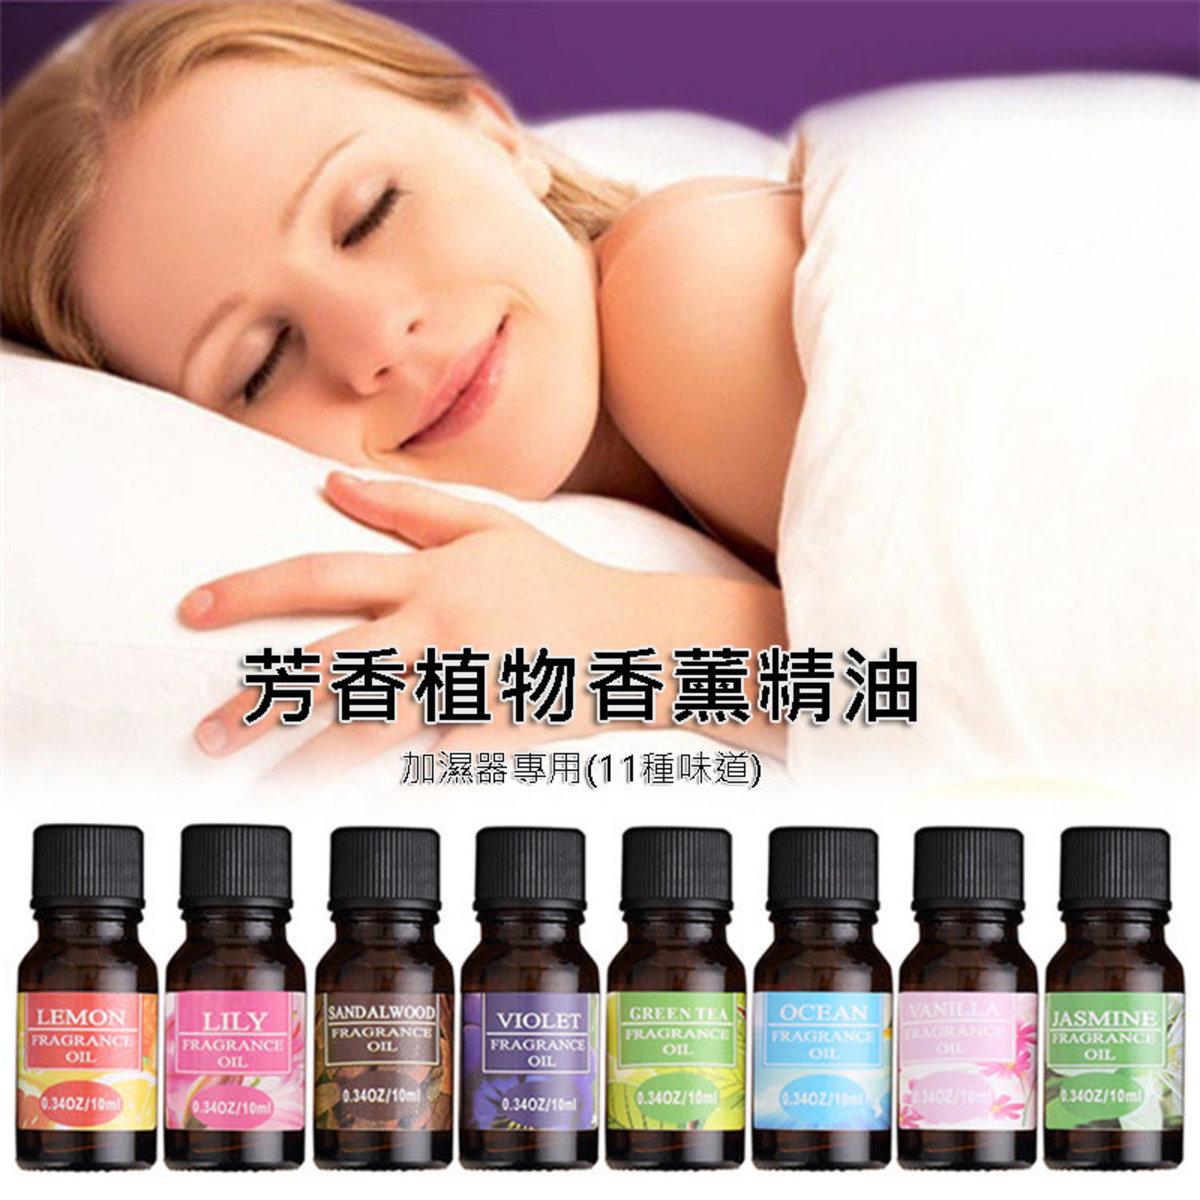 Ideal Fragrance Oil 10ml (For Air Revitalizer) - Lavender